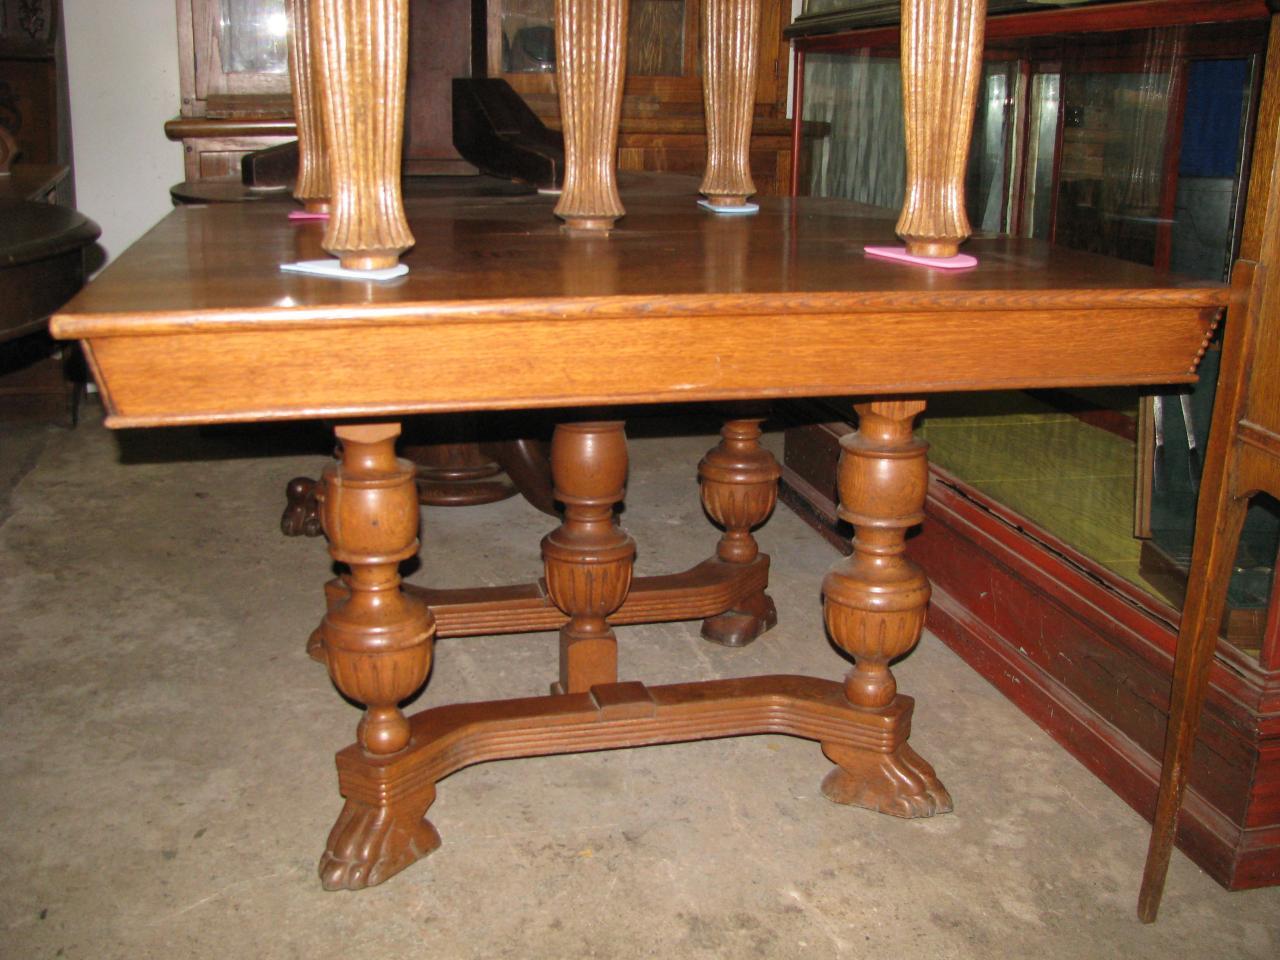 Z S Antiques Amp Restorations Antique Oak Walnut And Pine